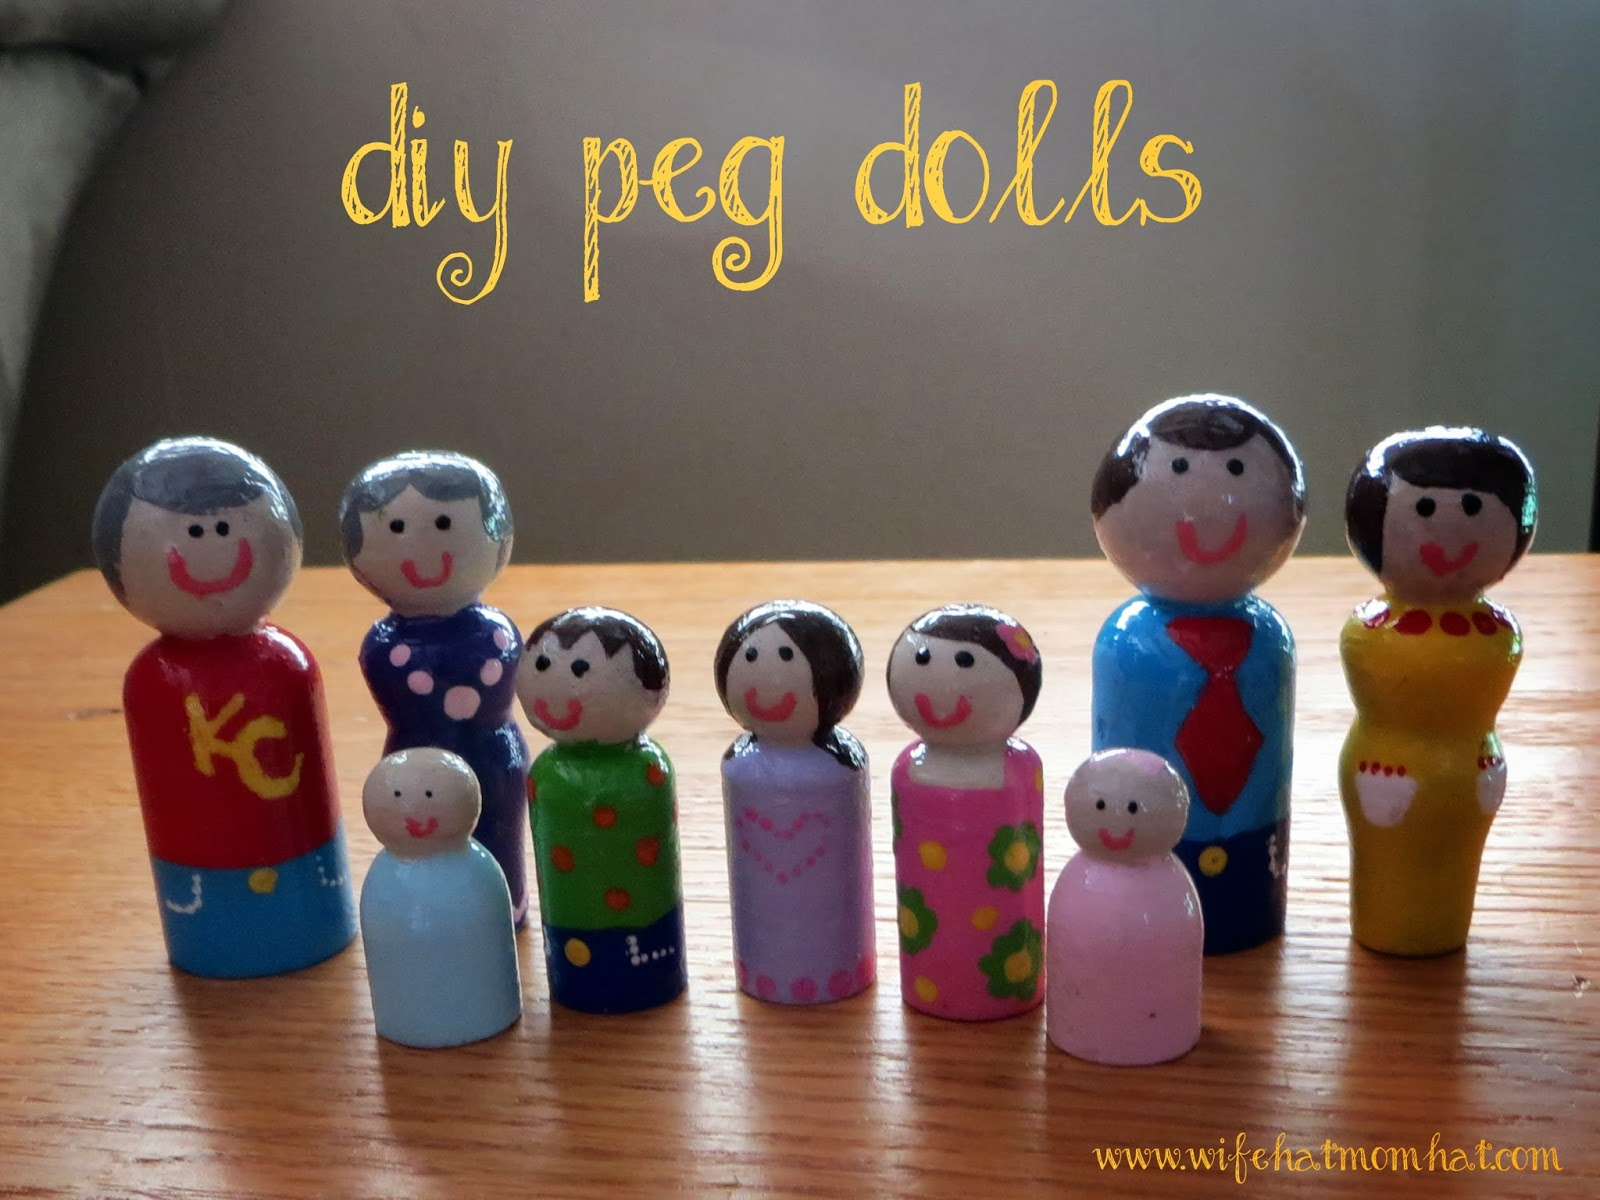 DIY Peg Dolls from Wife Hat Mom Hat